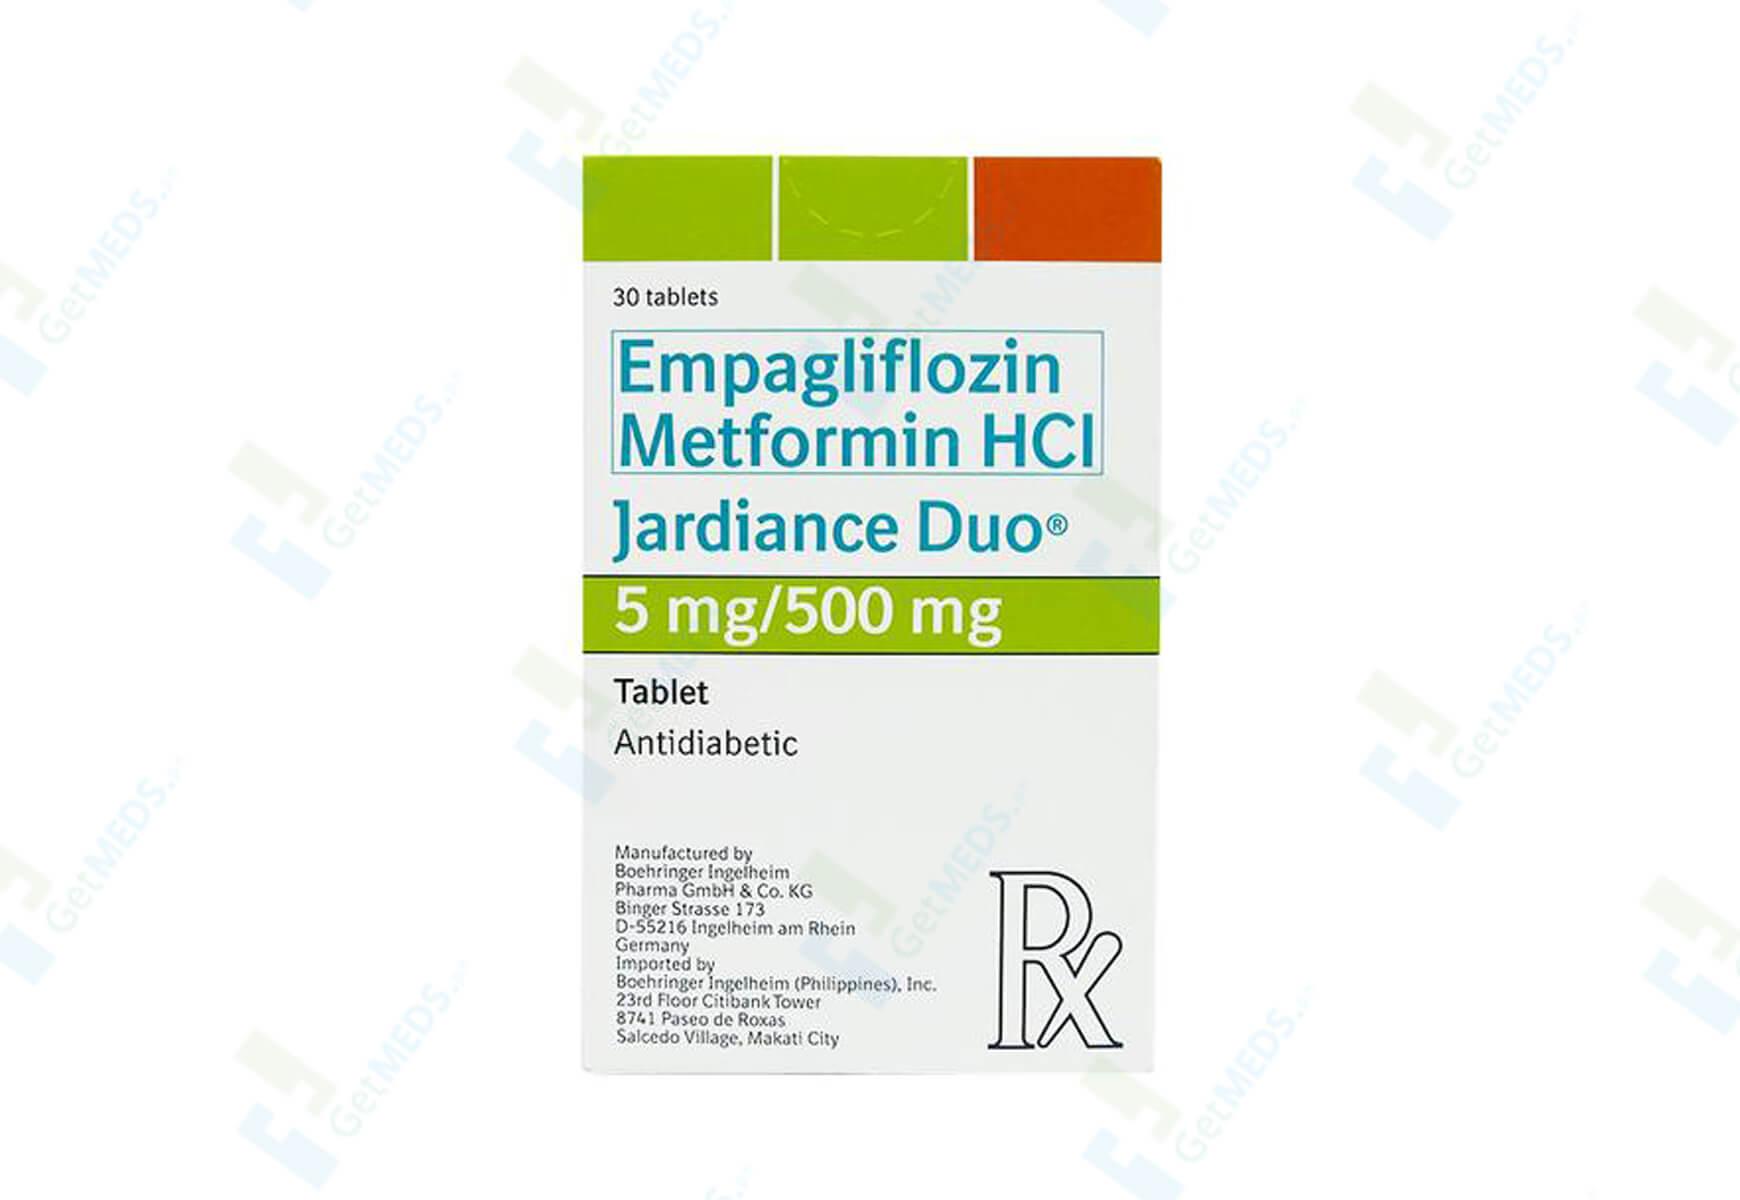 Jardiance Duo